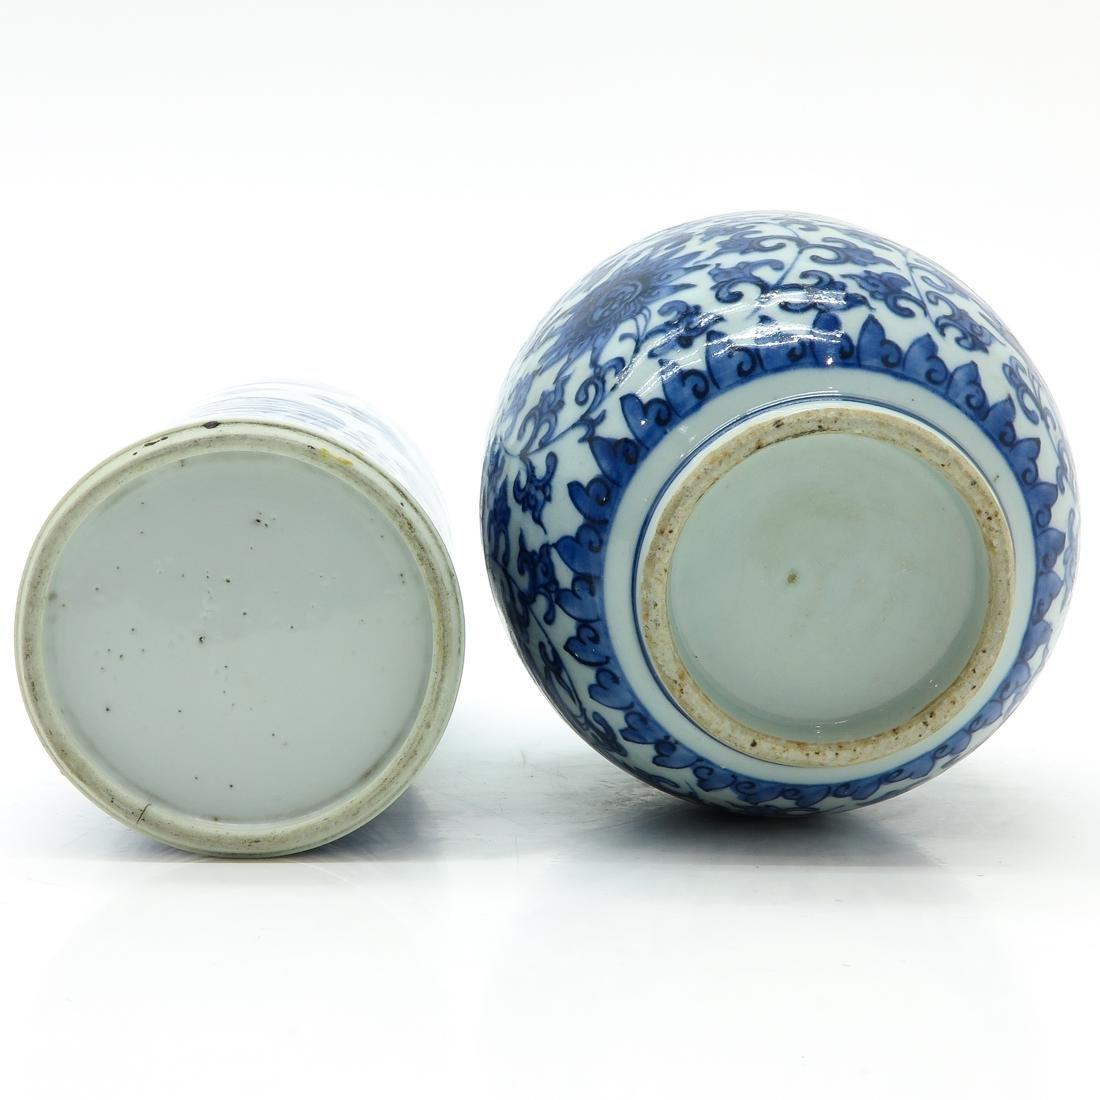 Lot of 2 Vases - 6